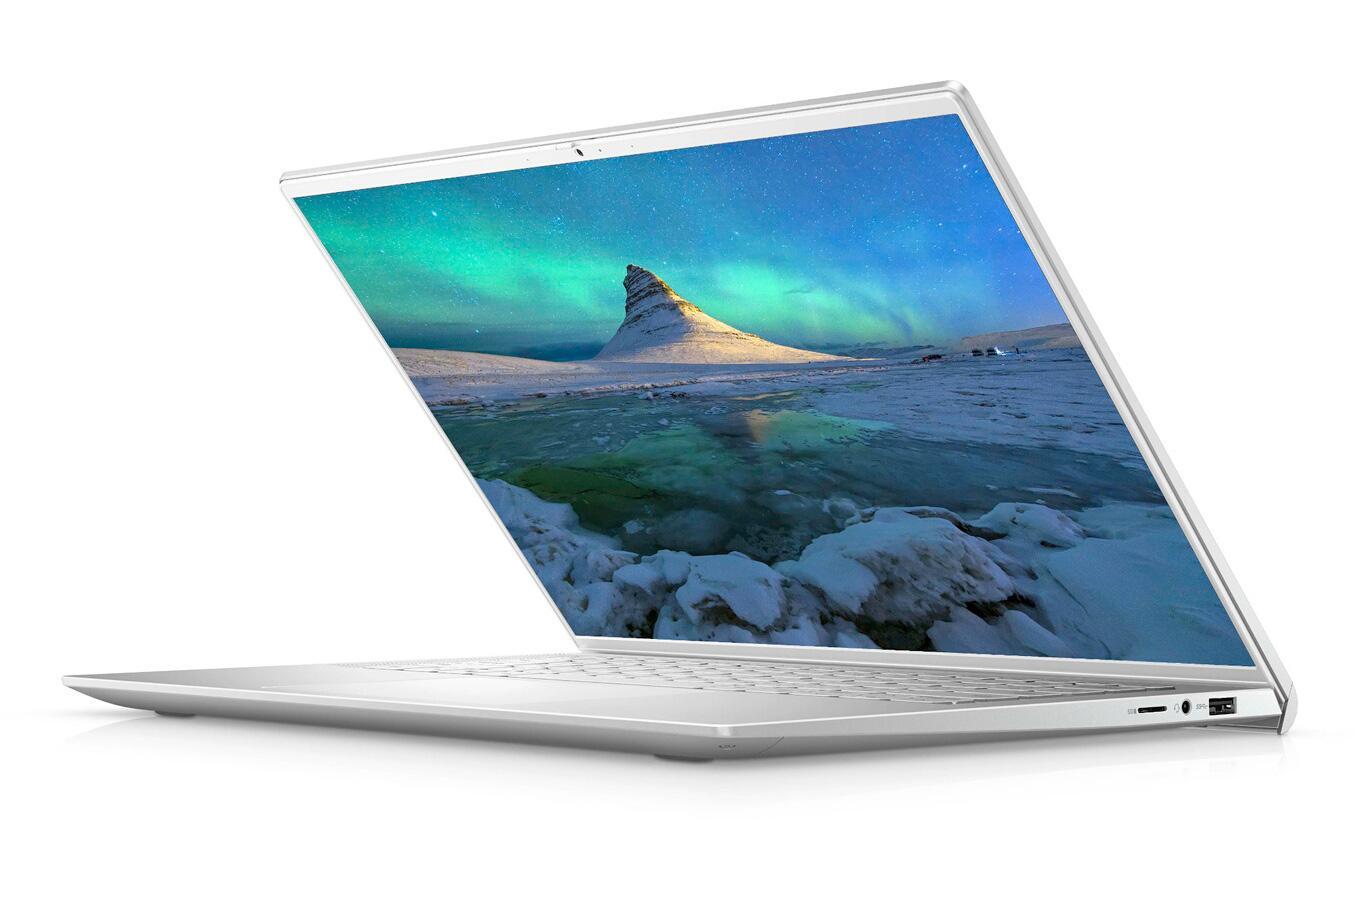 Ordinateur portable Dell Inspiron 14 7400 Argent - QHD+, MX350, Core i7  - photo 3